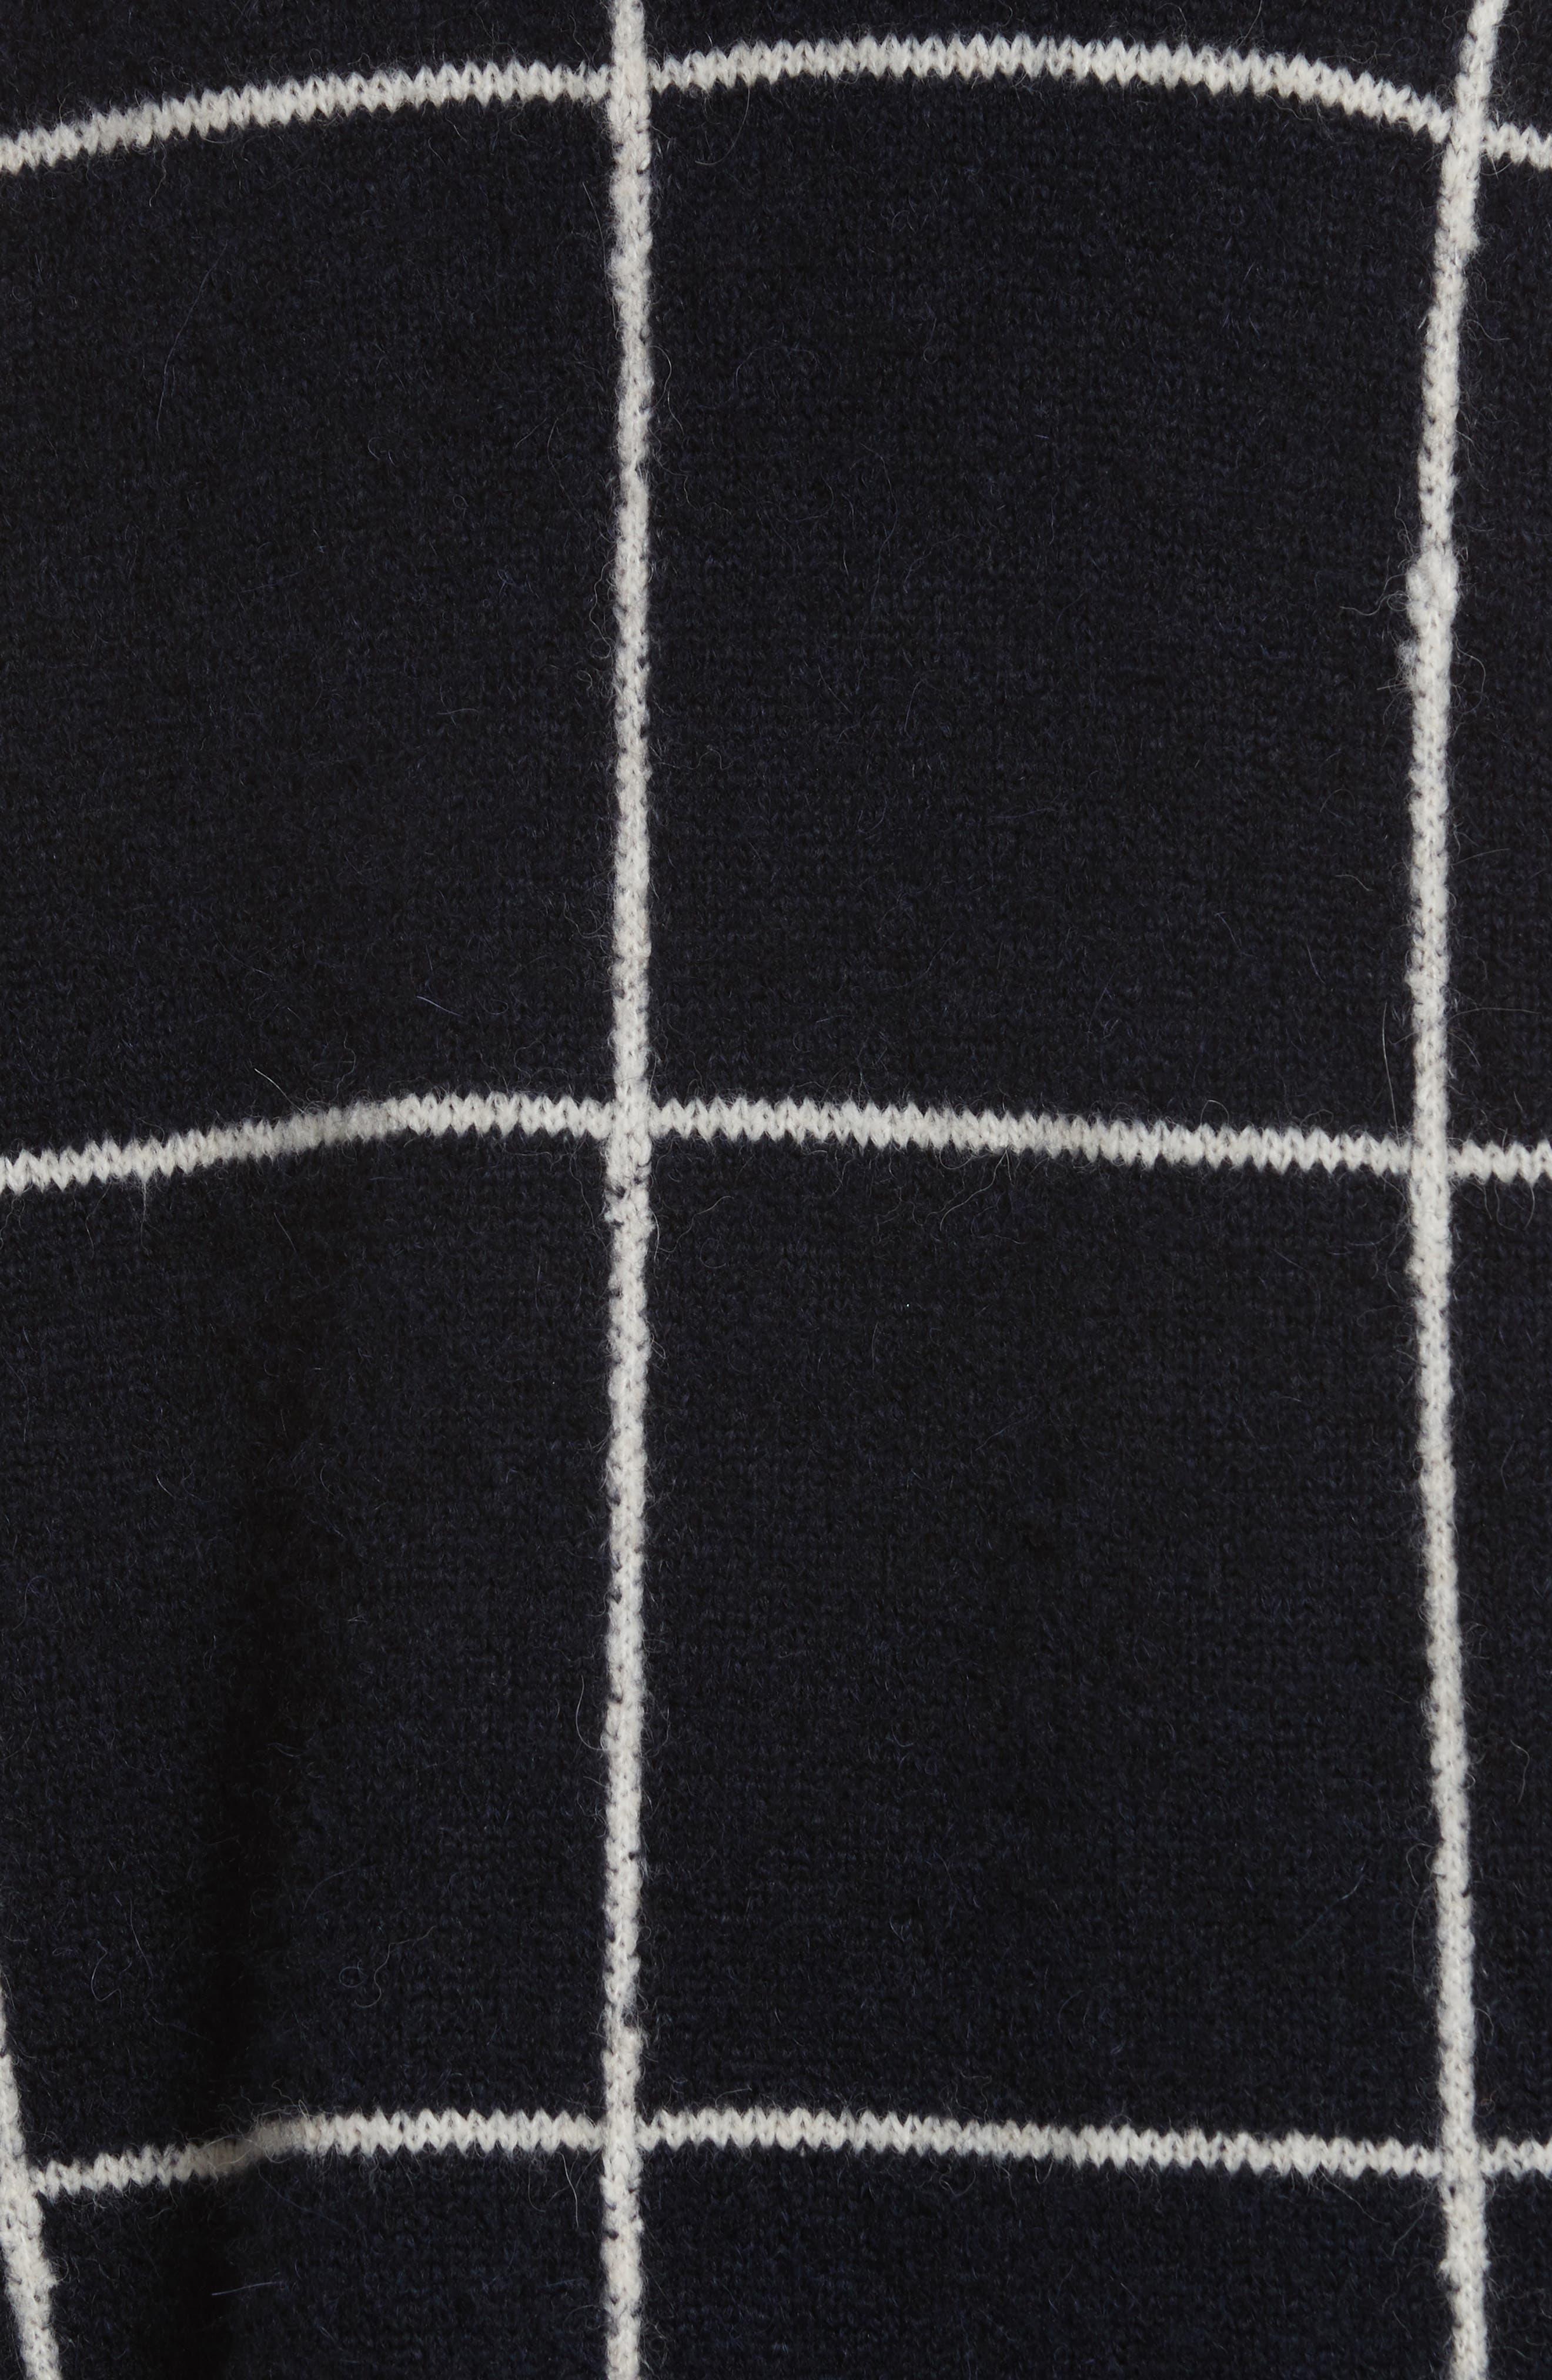 Fionn Windowpane Oversized Sweater,                             Alternate thumbnail 5, color,                             470